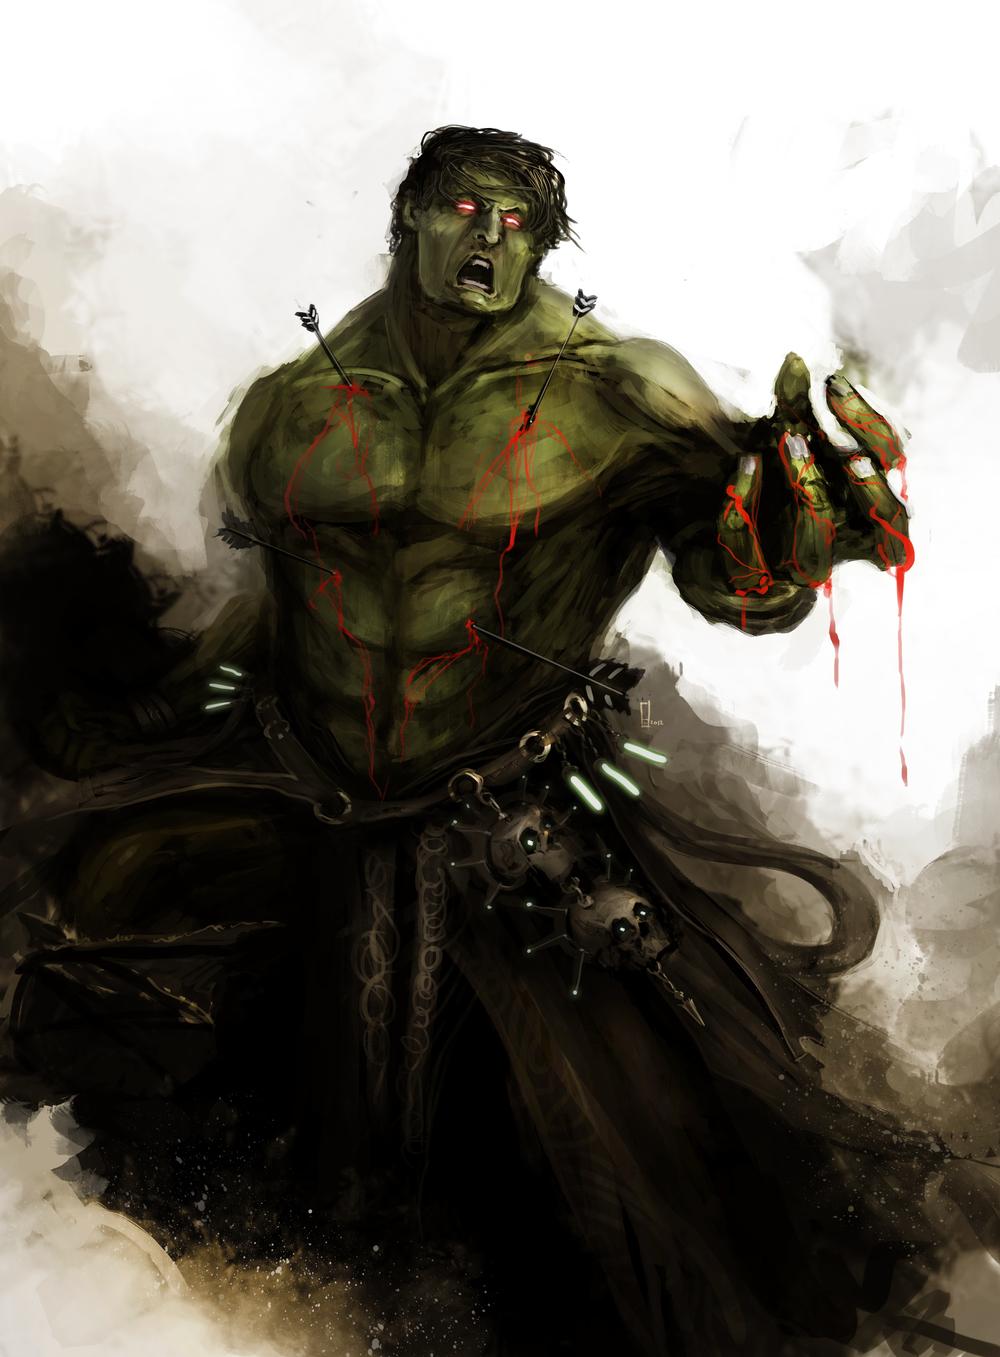 the_avengers___hulk_by_thedurrrrian-d53tnk5.jpg